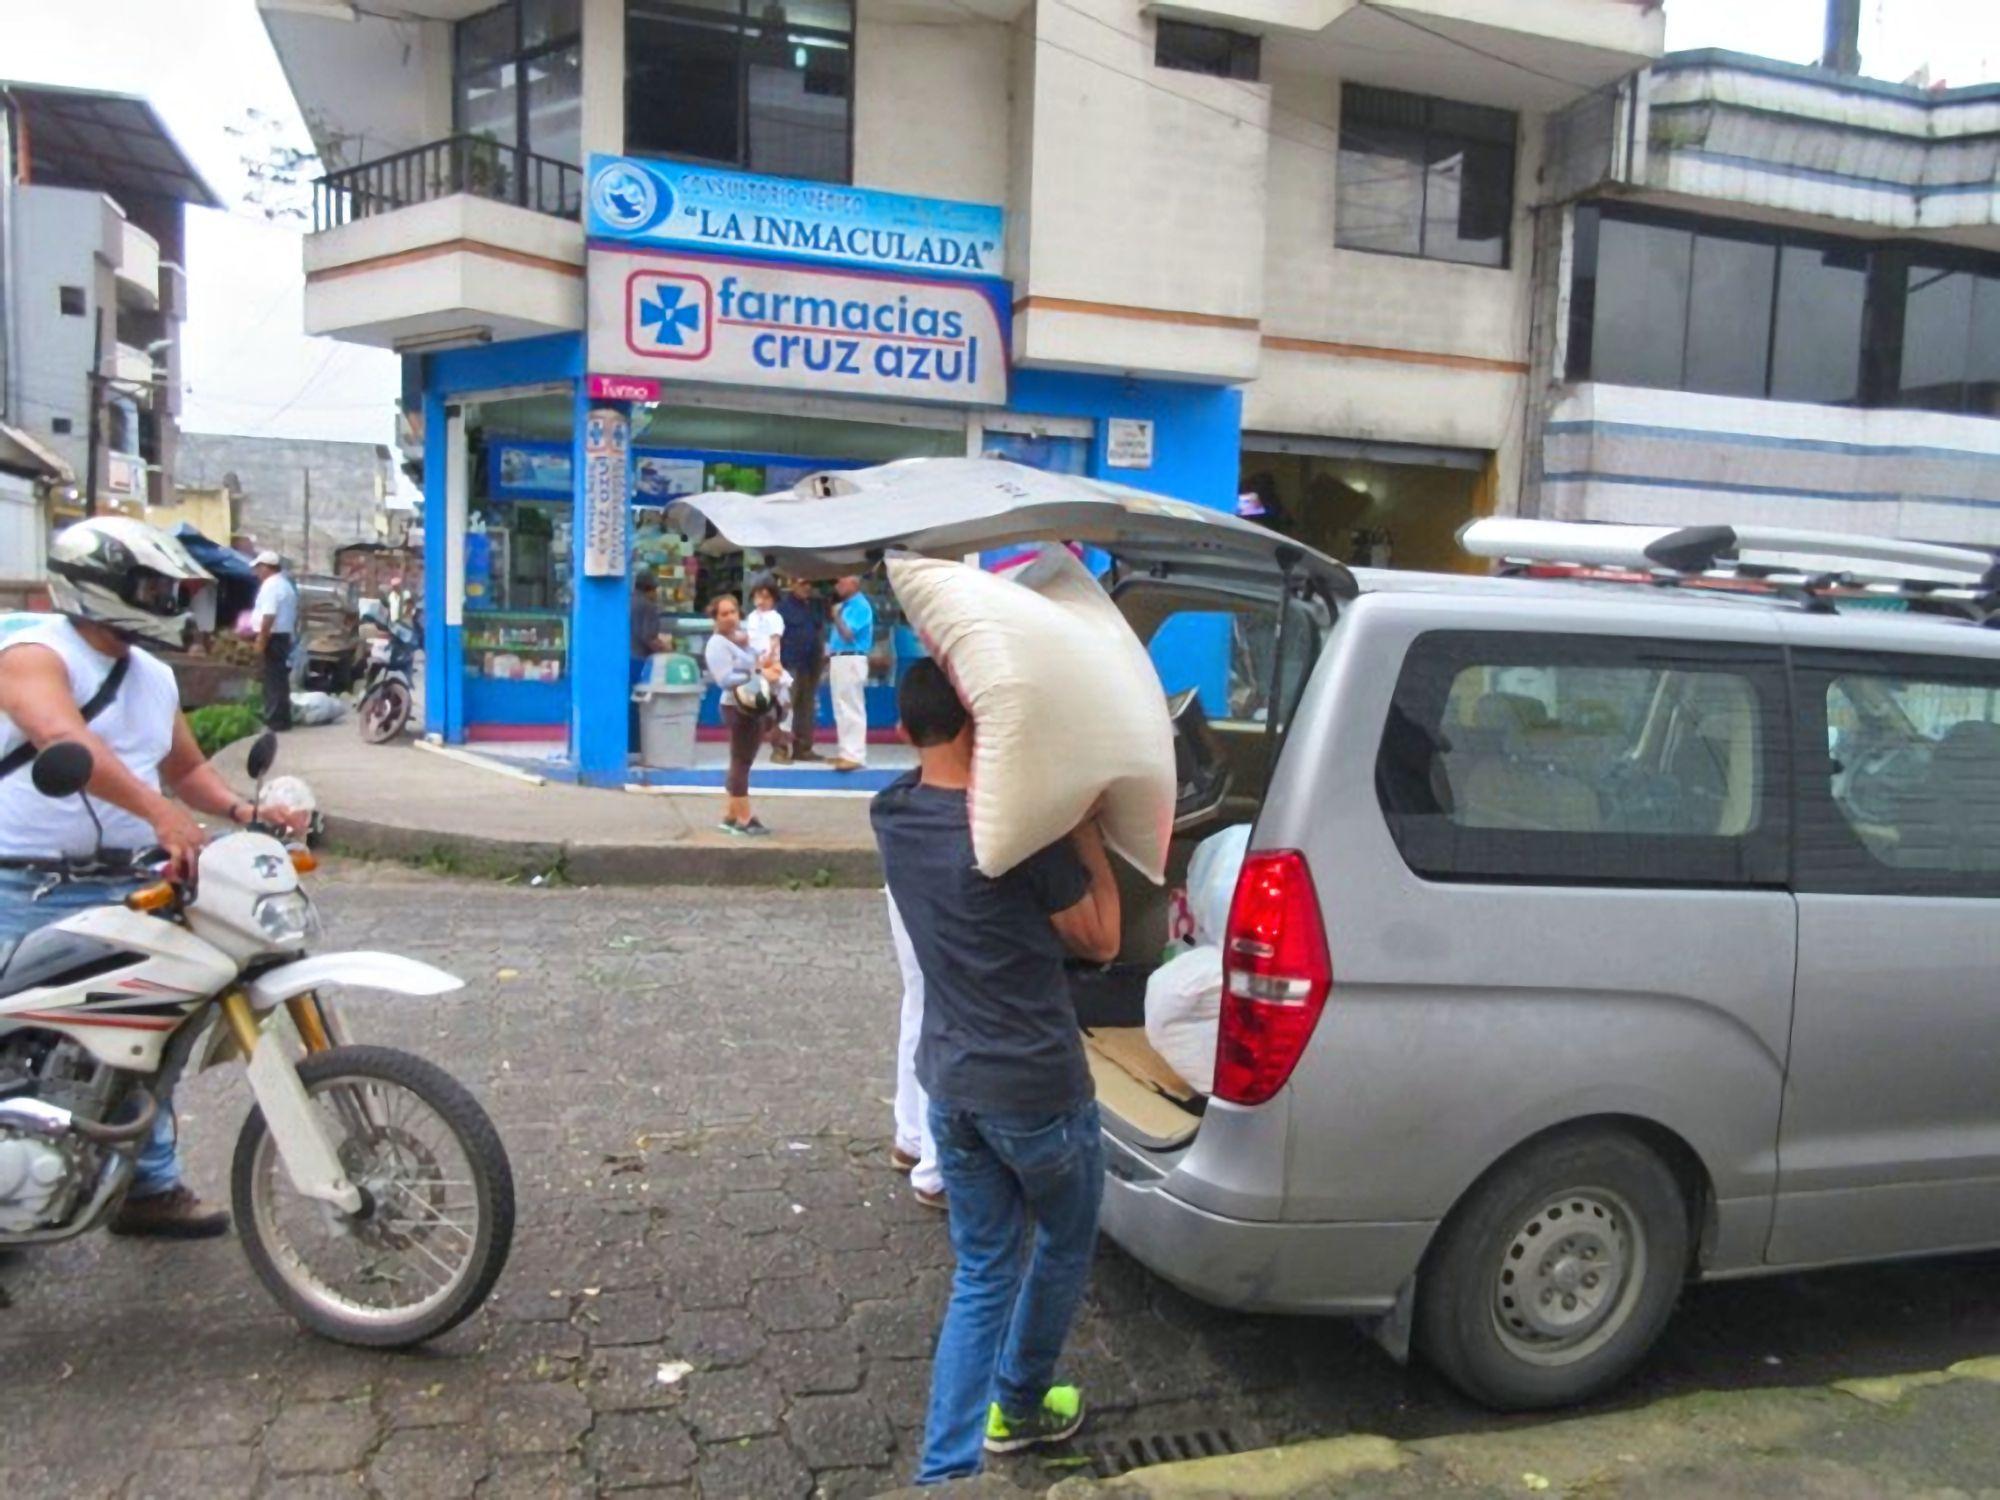 Rice seller Santo Domingo